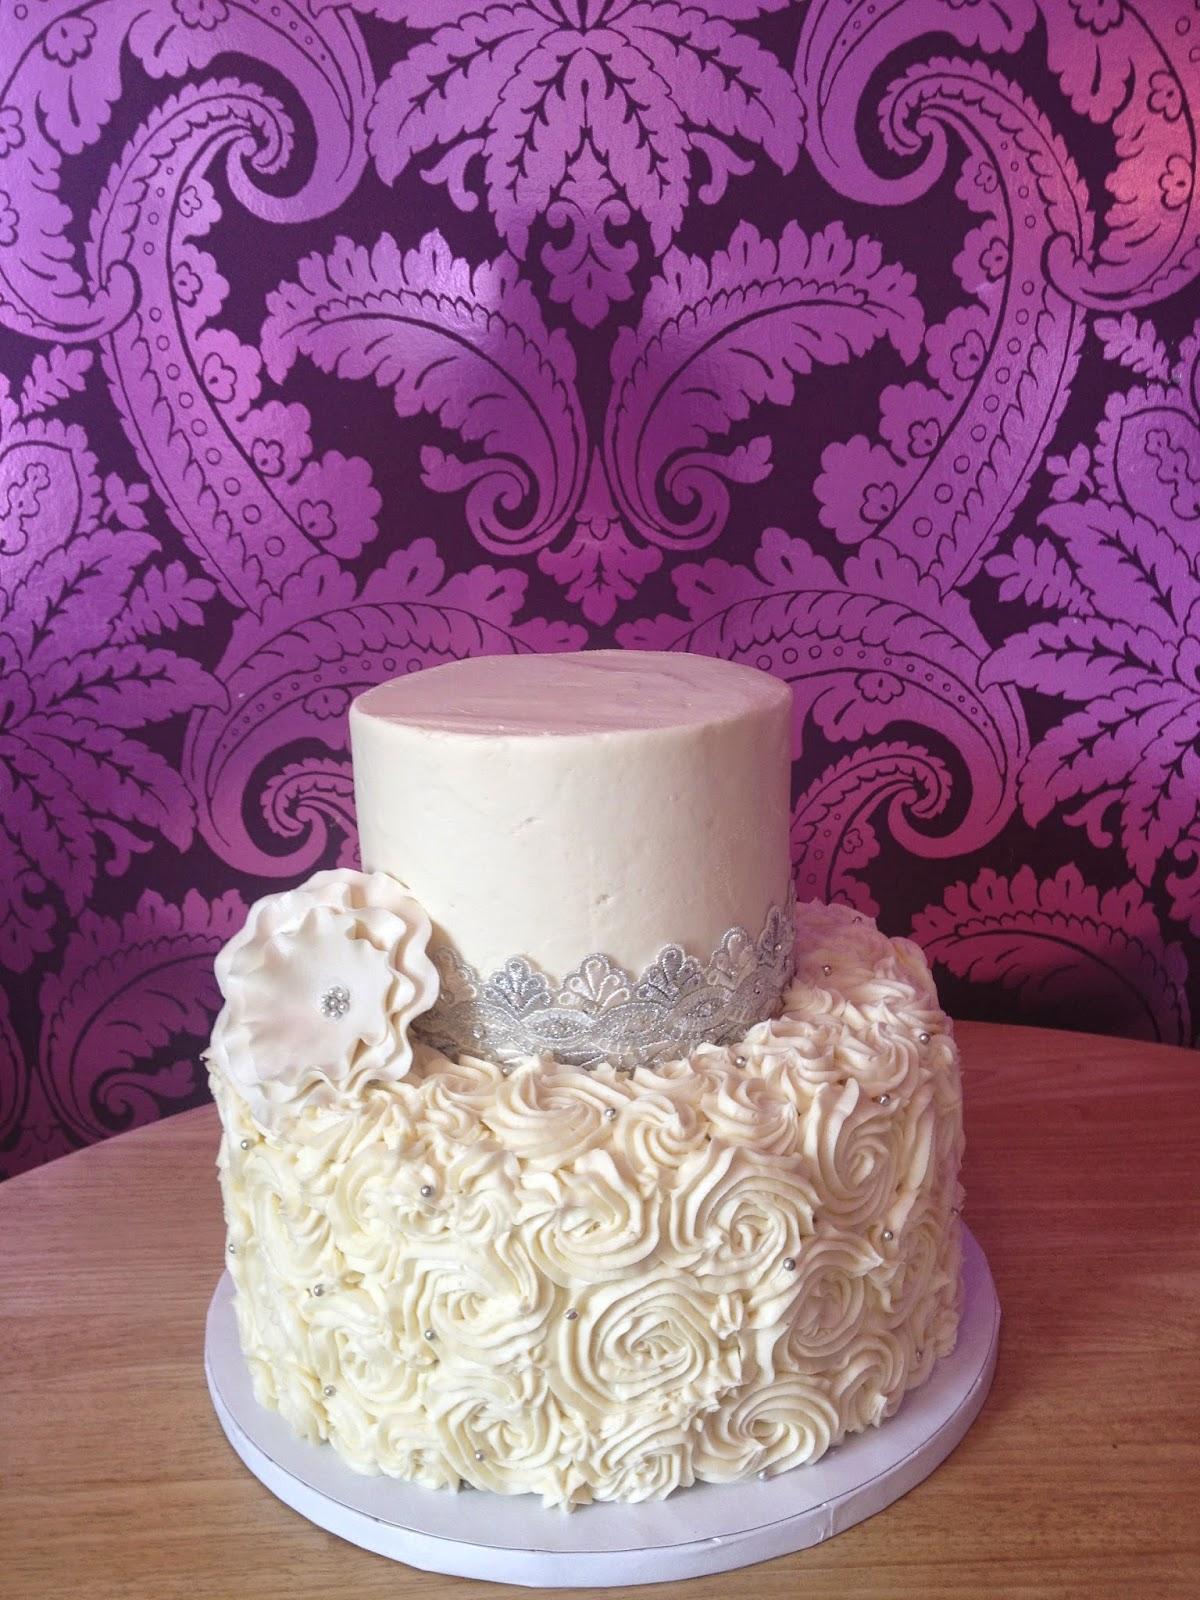 Bake My Day The Cake Boutique Wedding Wednesday Hot 10 Wedding